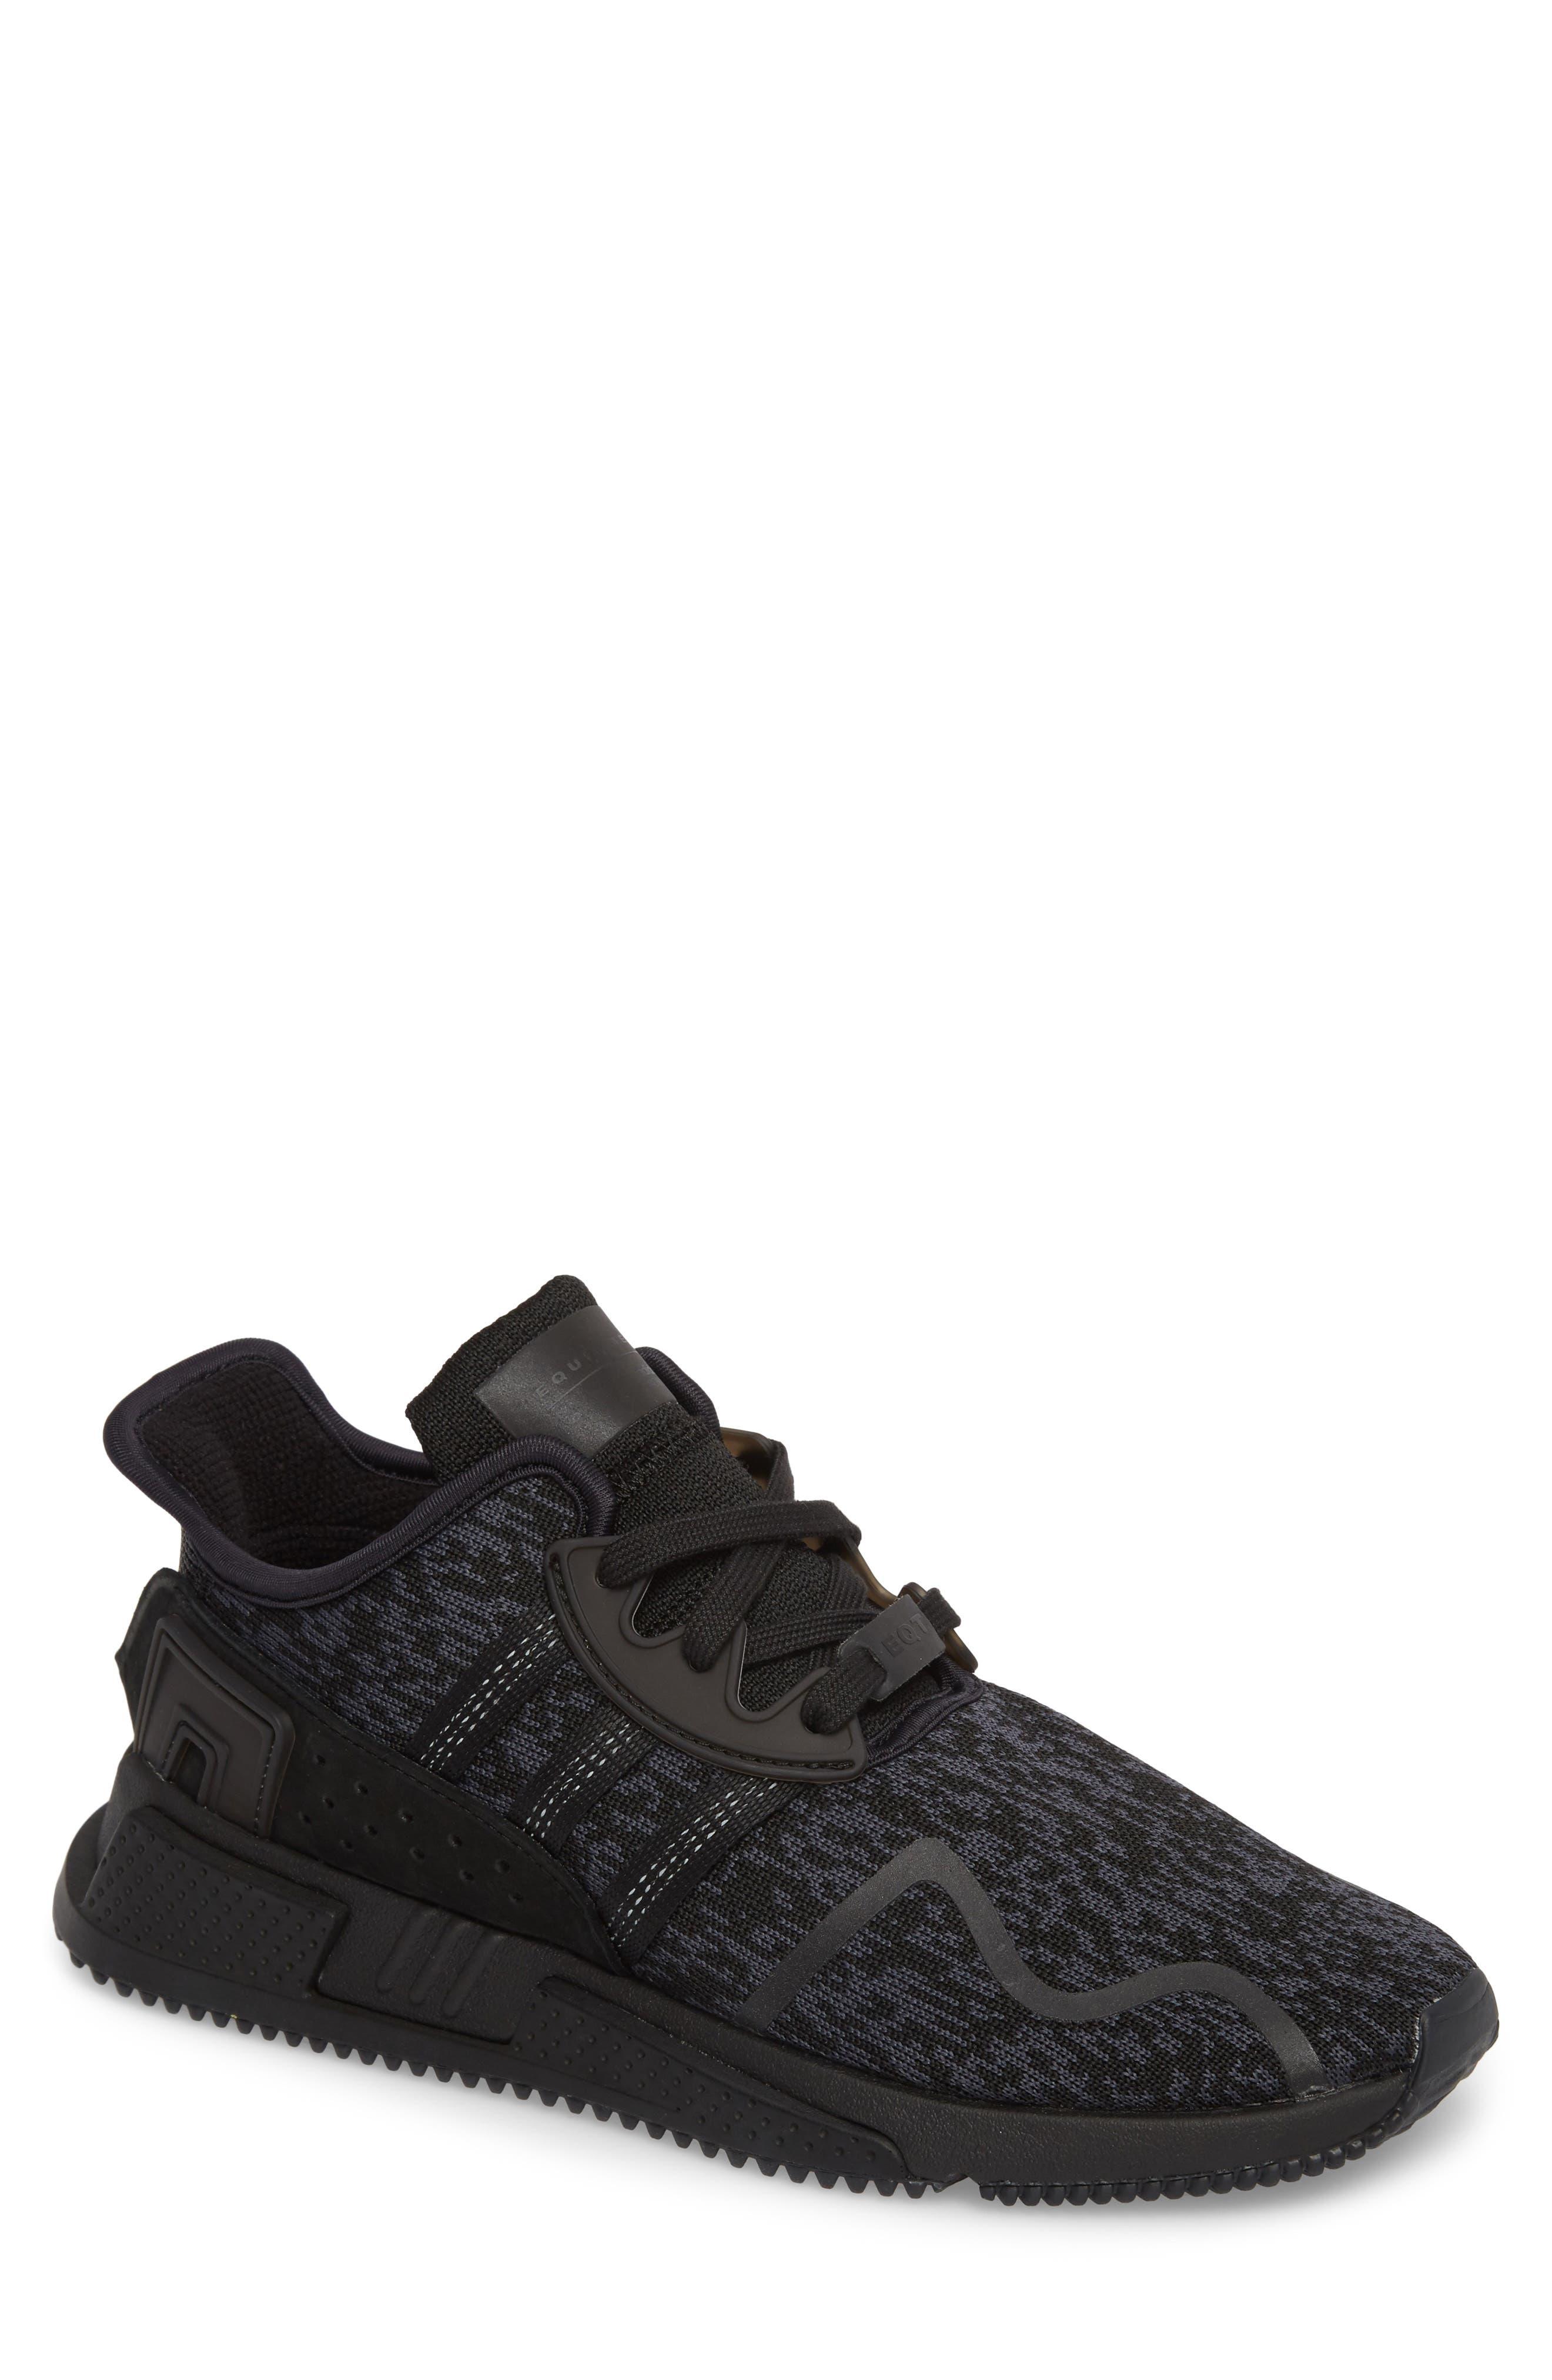 Main Image - adidas EQT Cushion ADV Sneaker (Men)